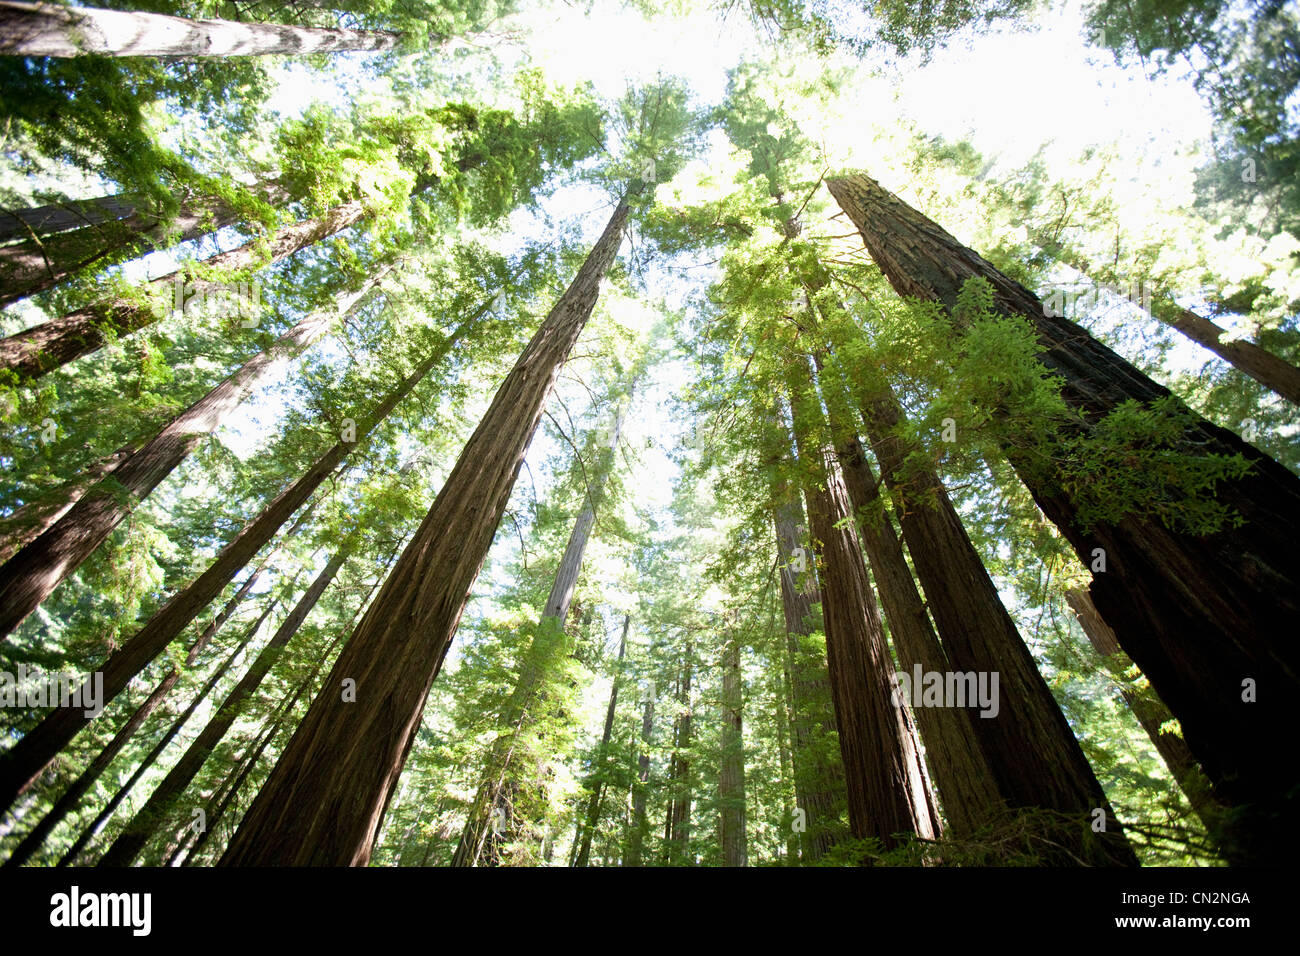 Bäume im Wald, niedrigen Winkel Ansicht Stockbild